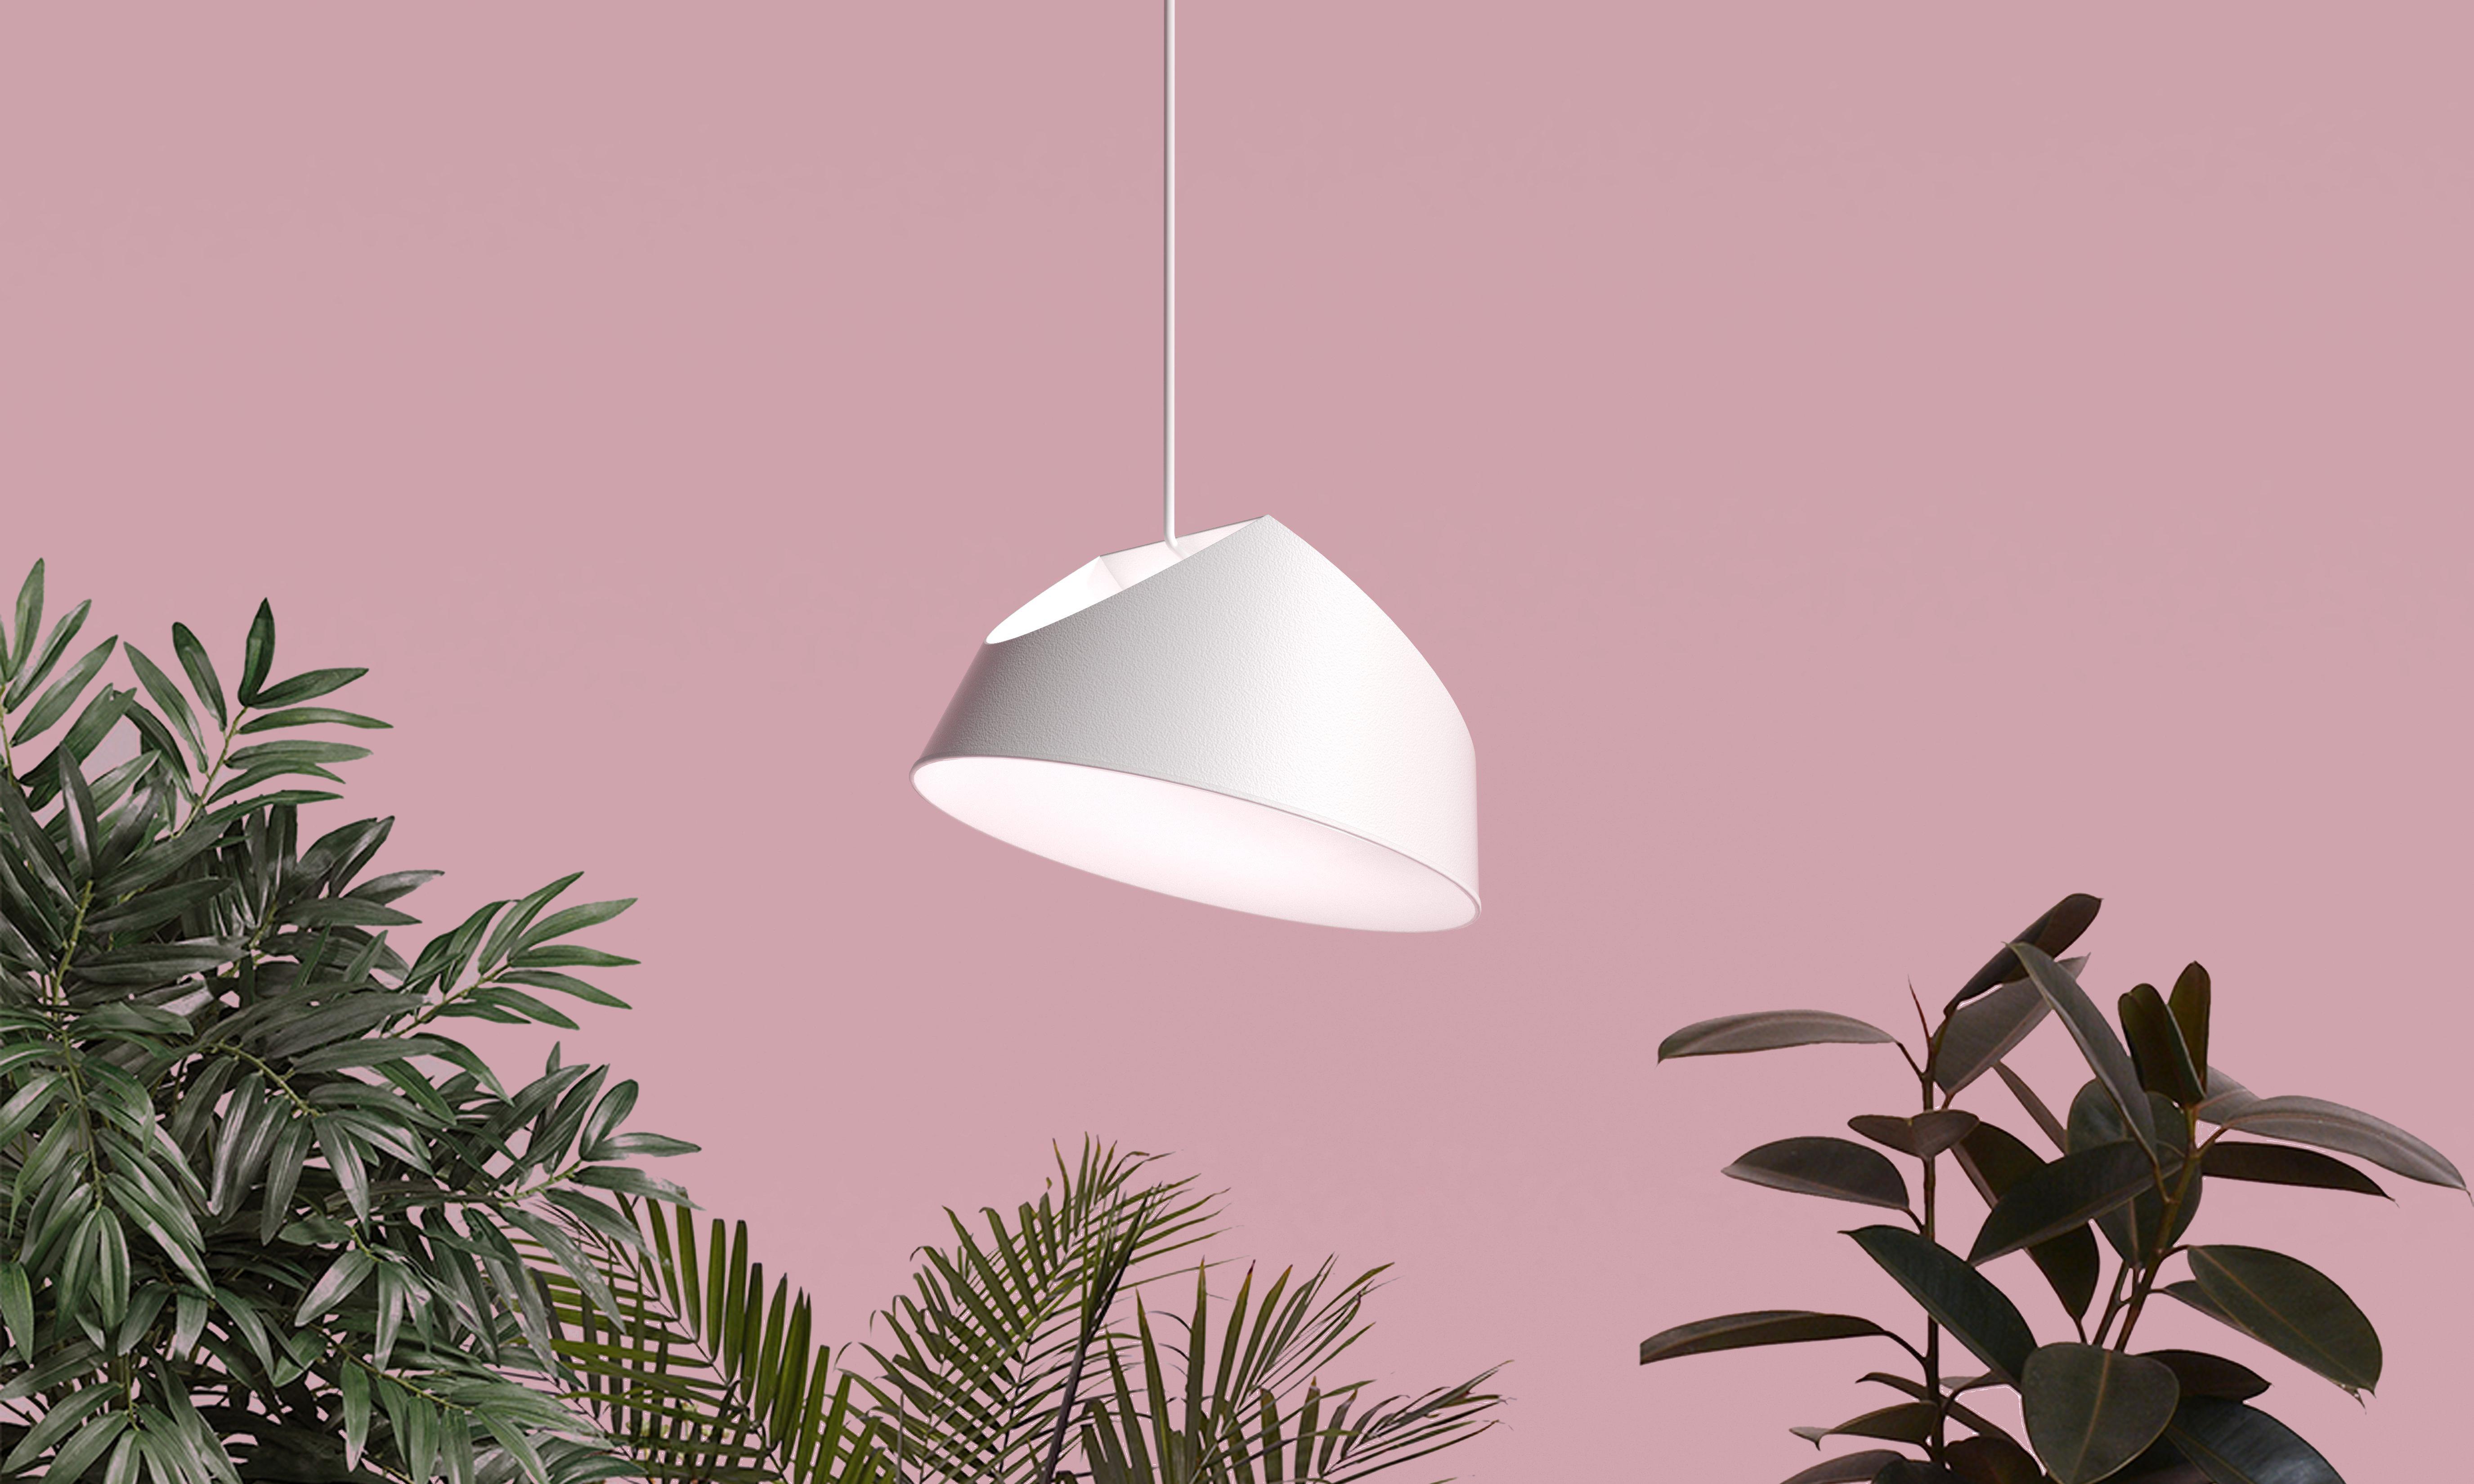 Lampara Colgante Diseño Tendencias Iluminacion